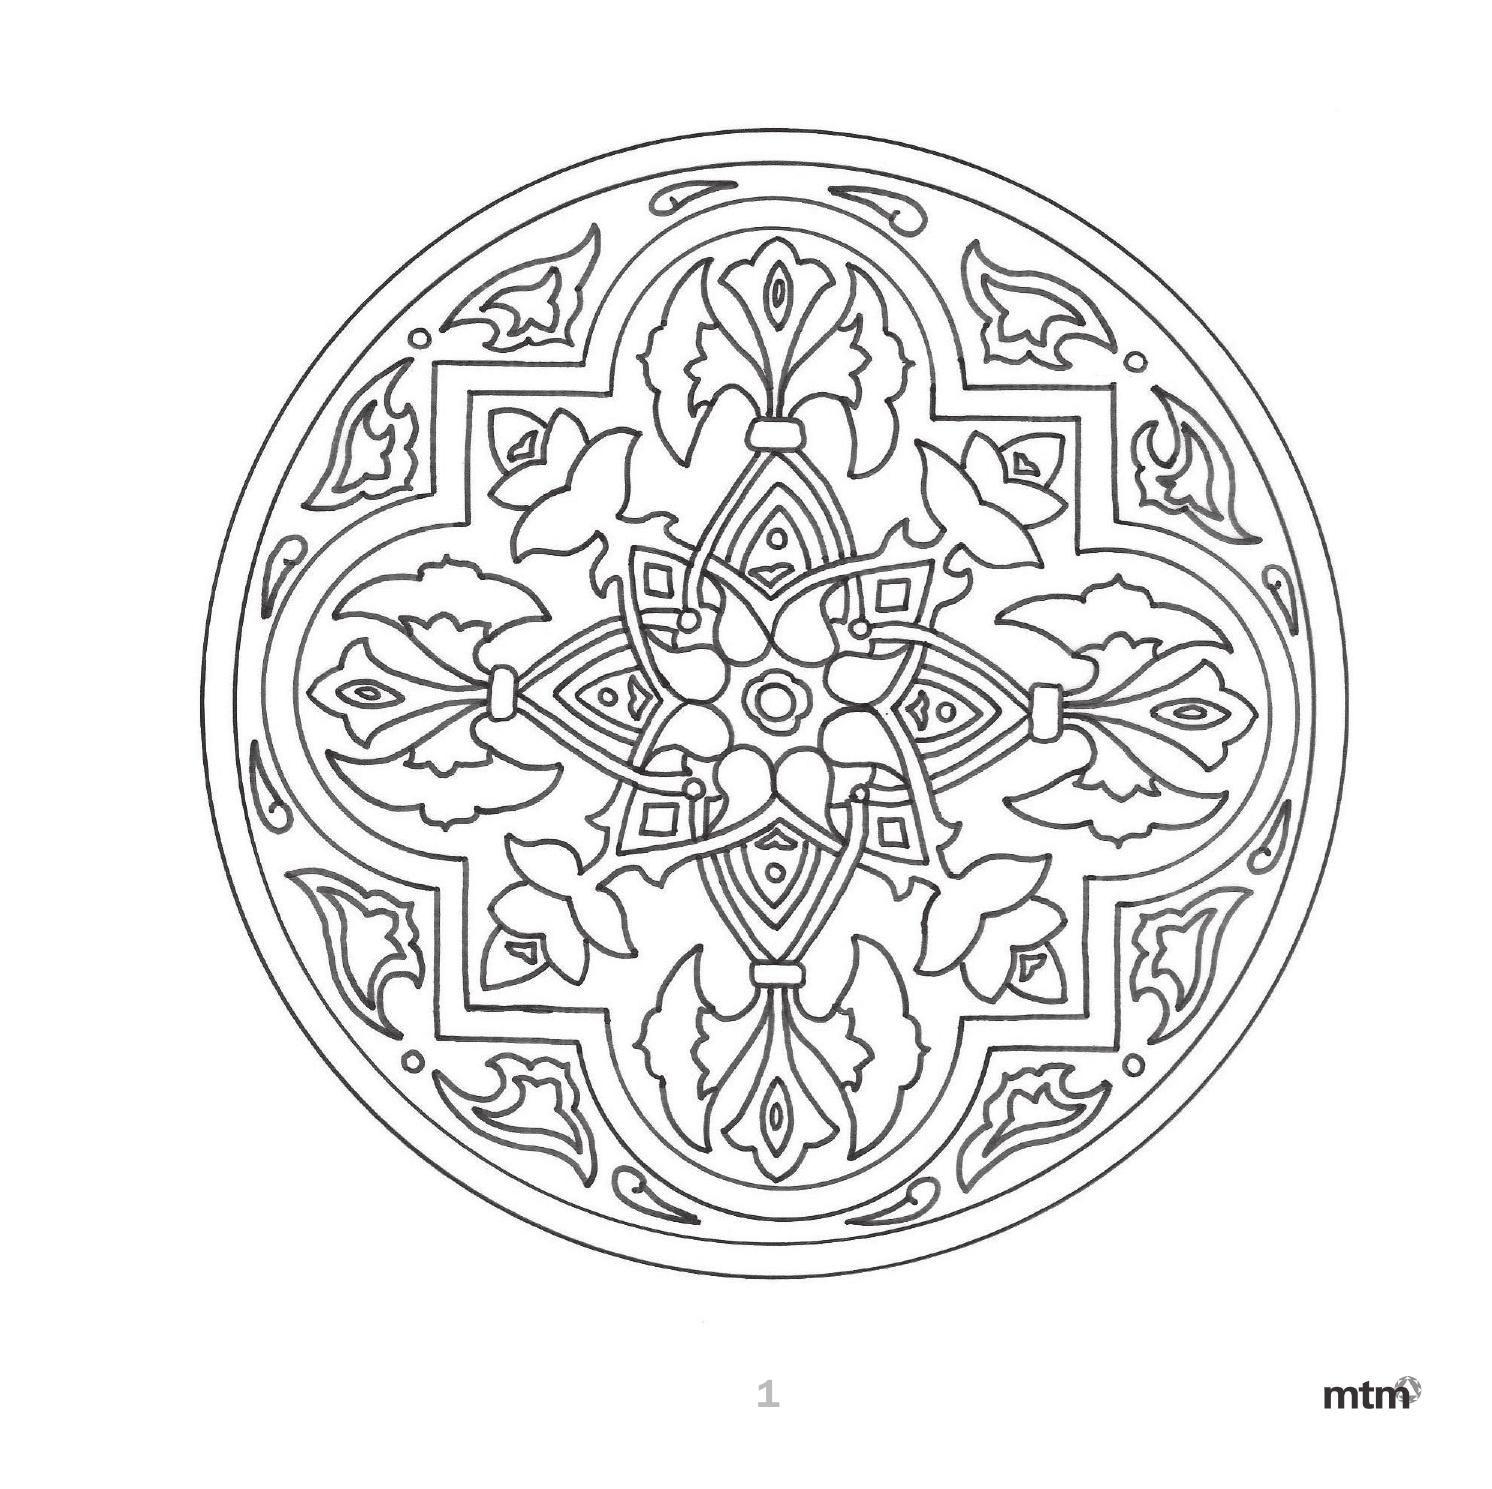 Arte Andaluz En Mandalas Mtm Editores Arte Mandalas Azulejos Andaluces